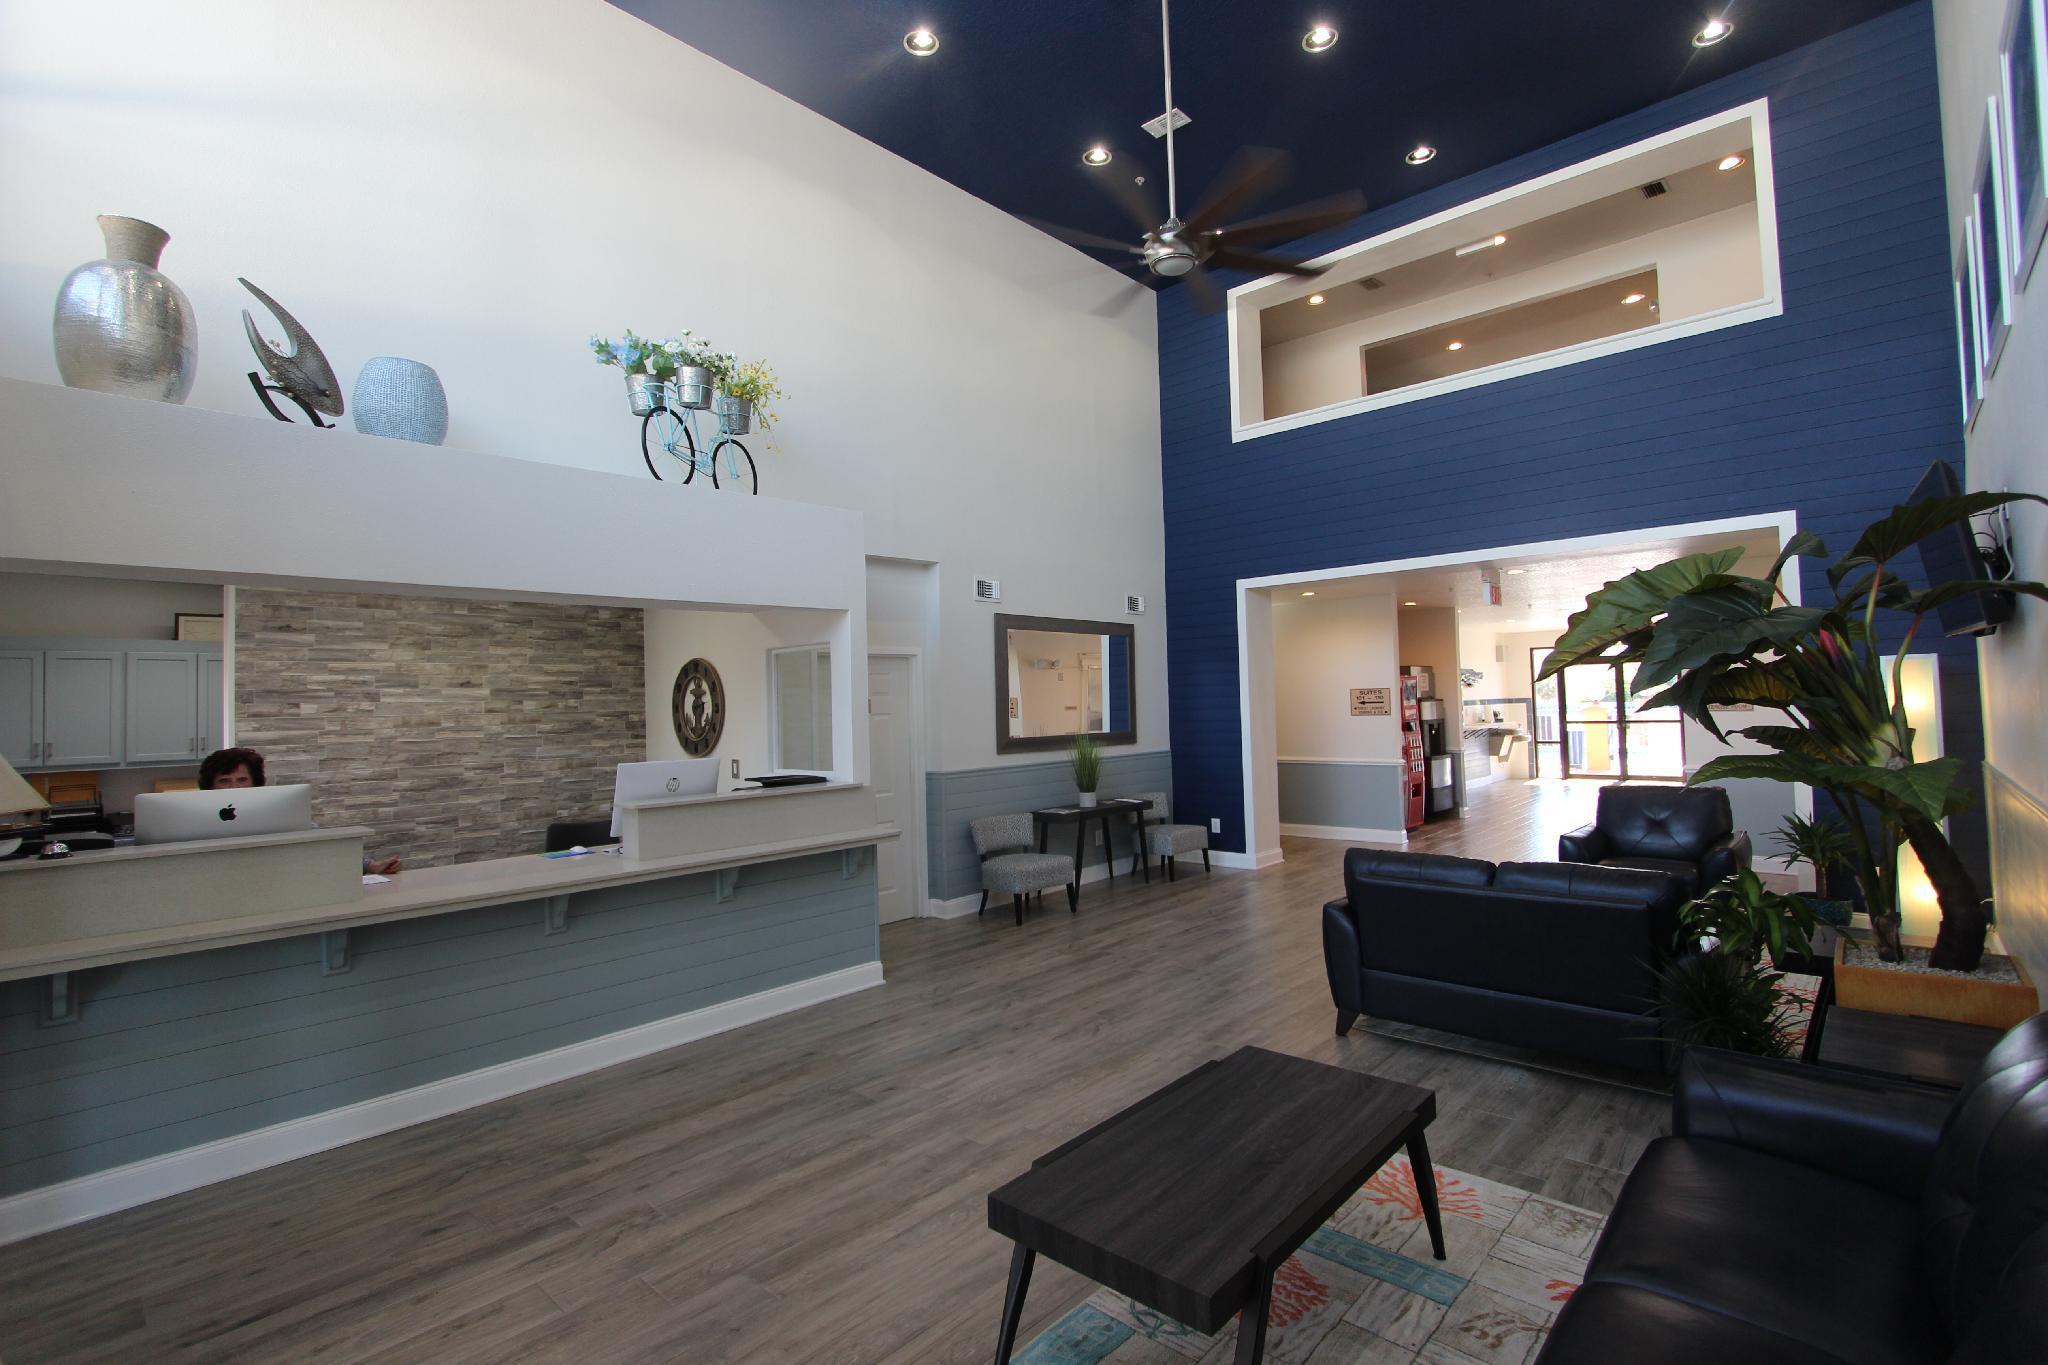 Luxury Suites Of Pensacola